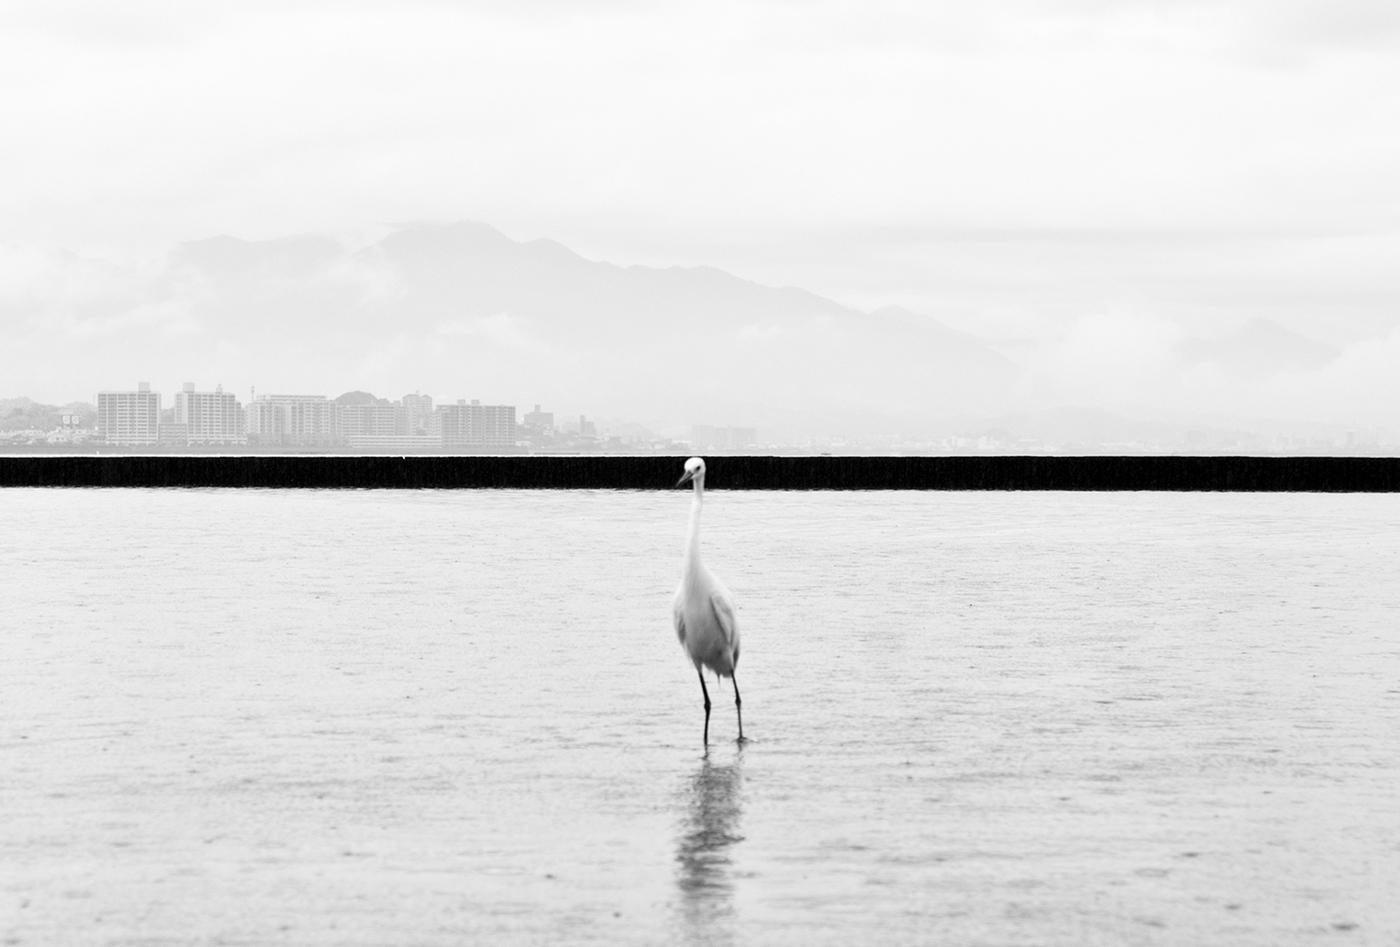 Hiroshima – Phoenix Rising from the Ashes,  Minimalist And Symbolic Photography